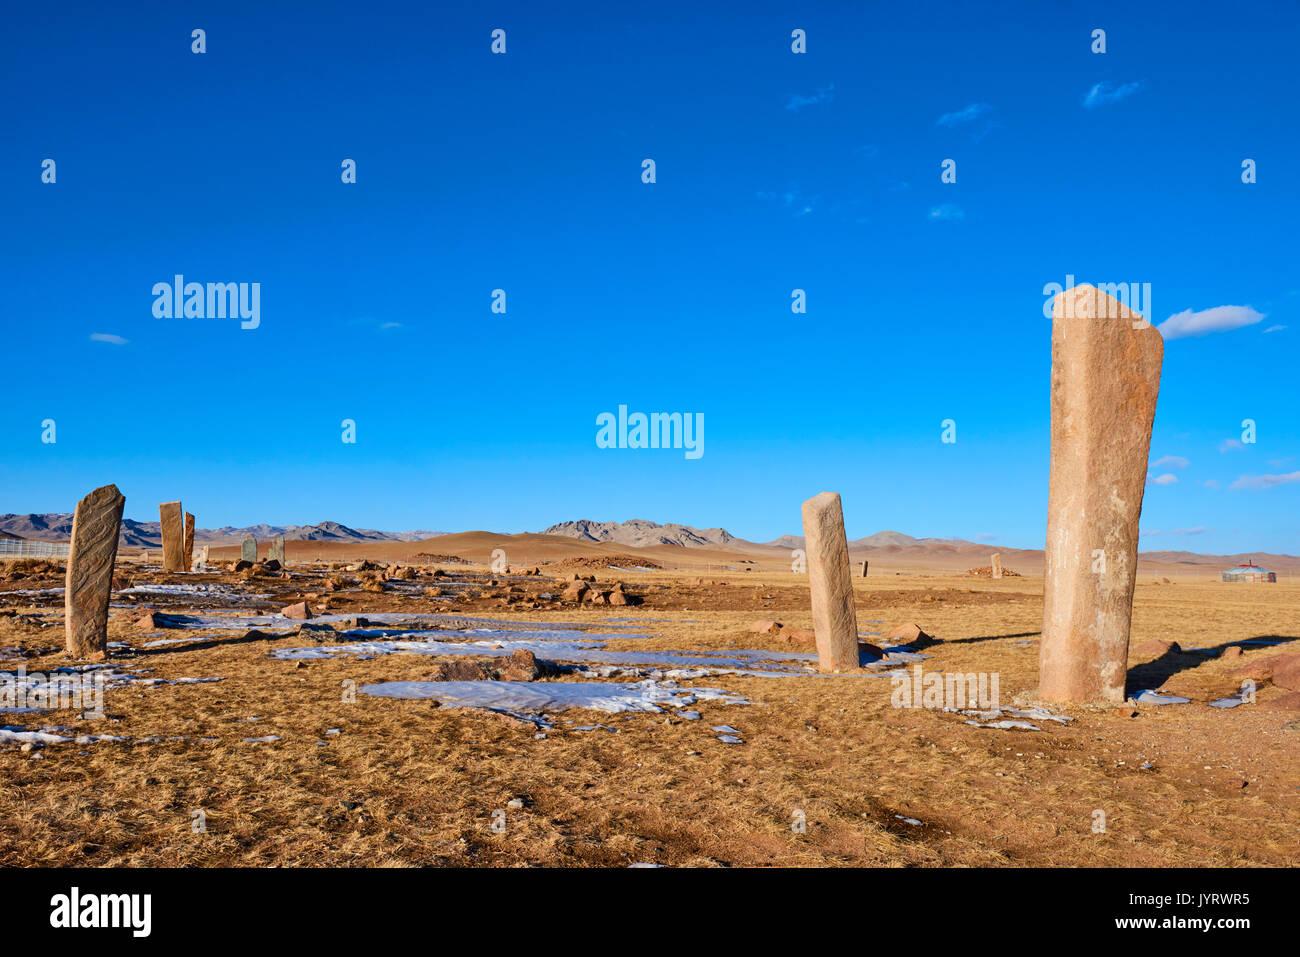 Mongolia, Khuvsgul province, Moron, group of Deer Stones of Uushigiin Uver - Stock Image